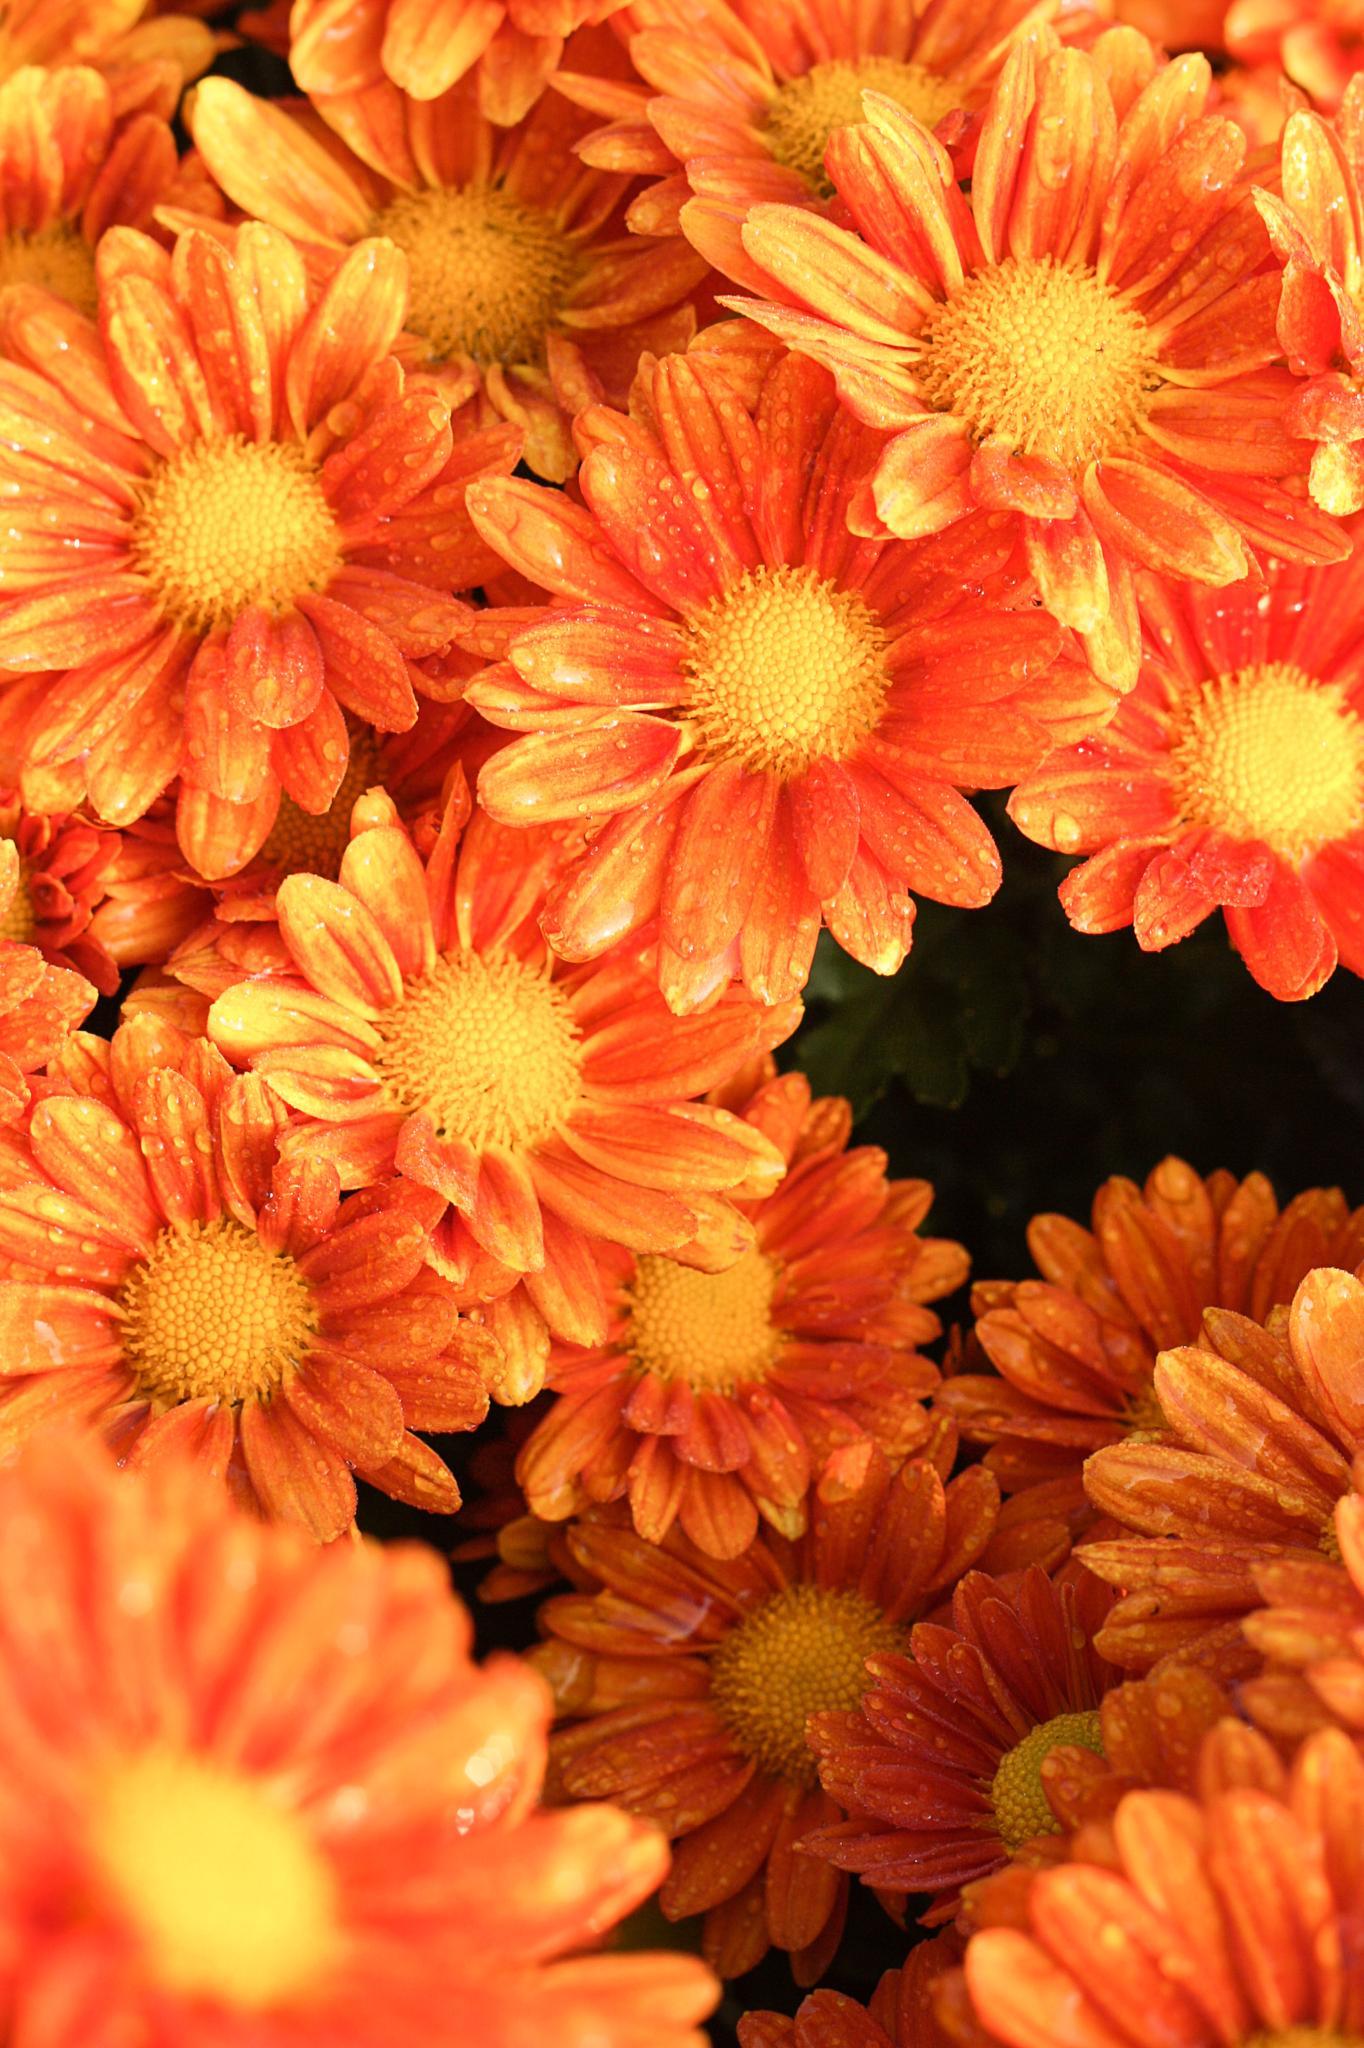 the orange flower  by samrithnalumpoon